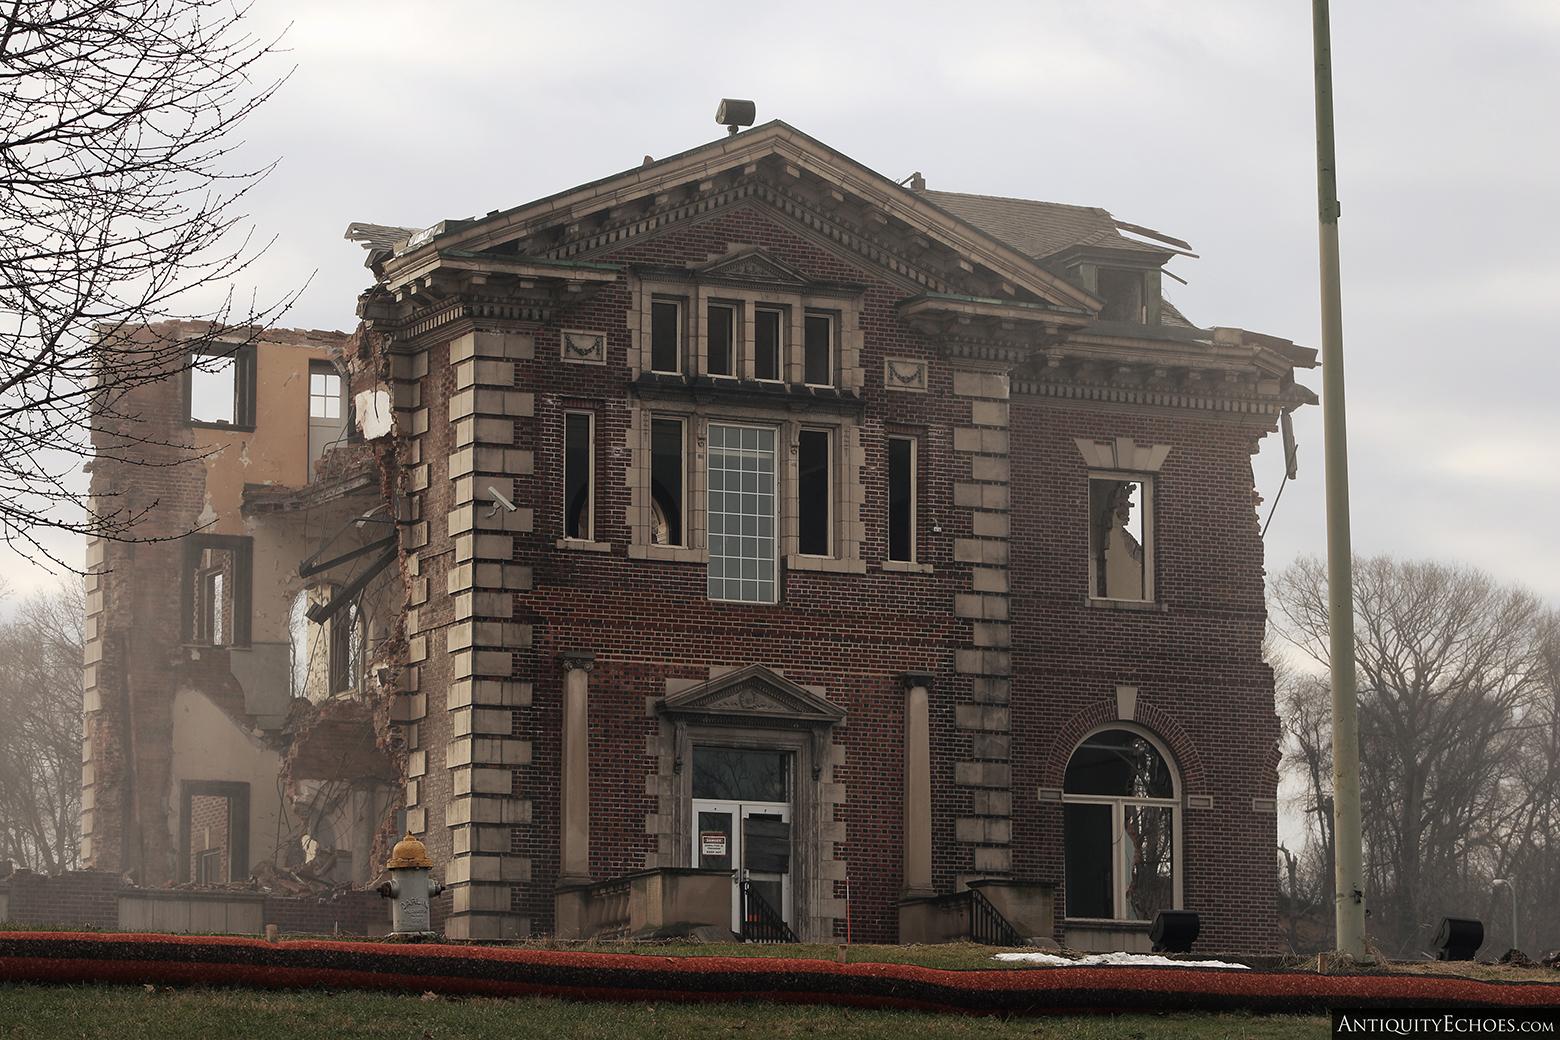 Allentown State Hospital - Demolition - Laid Waste